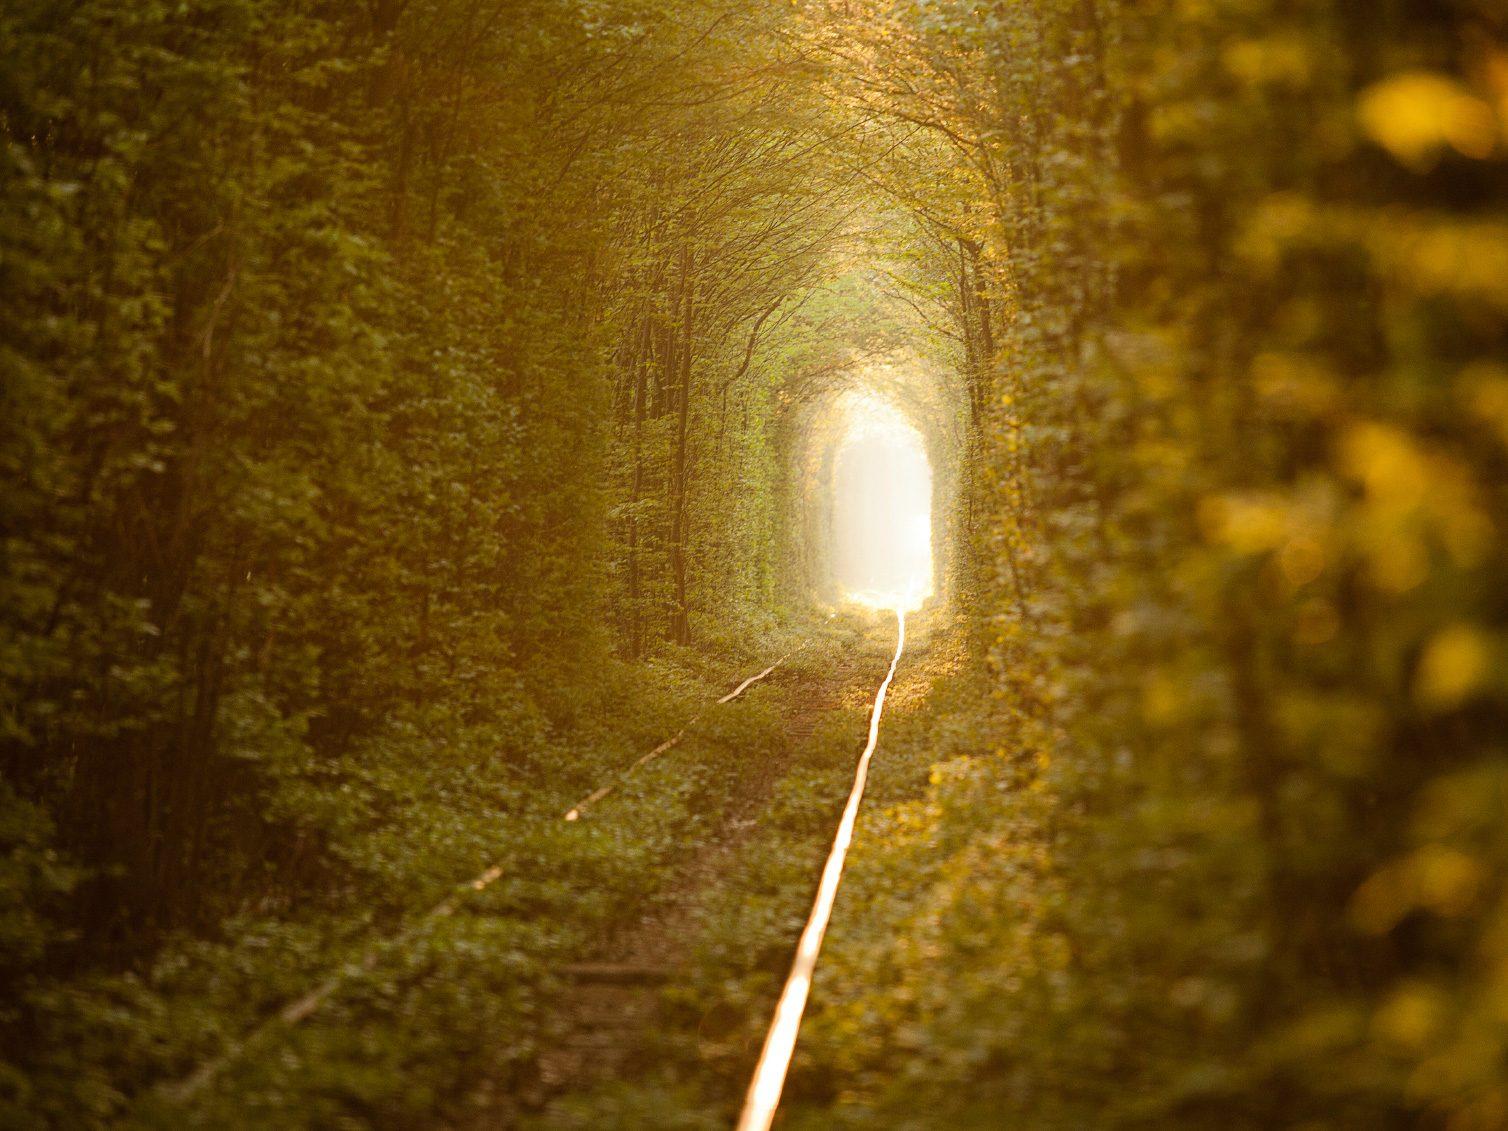 Natural Wonders to See Before You Die: Tunnel of Love, Ukraine